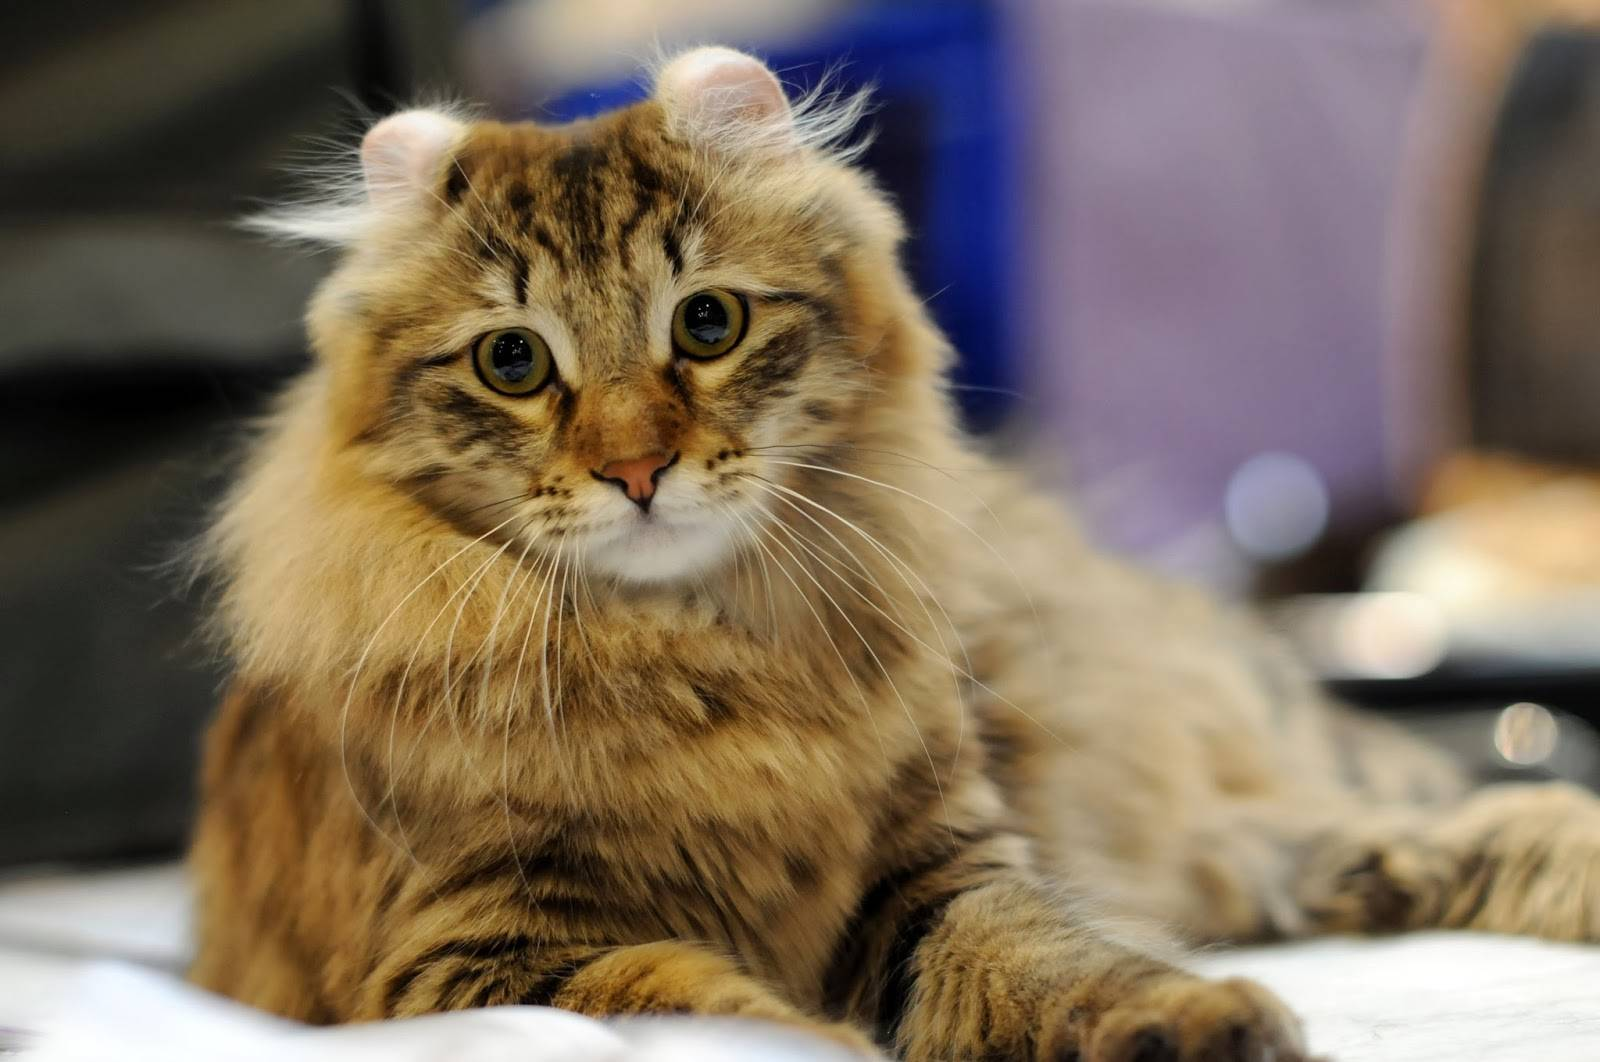 Американский керл кошка. описание, уход и цена кошки американский керл | животный мир